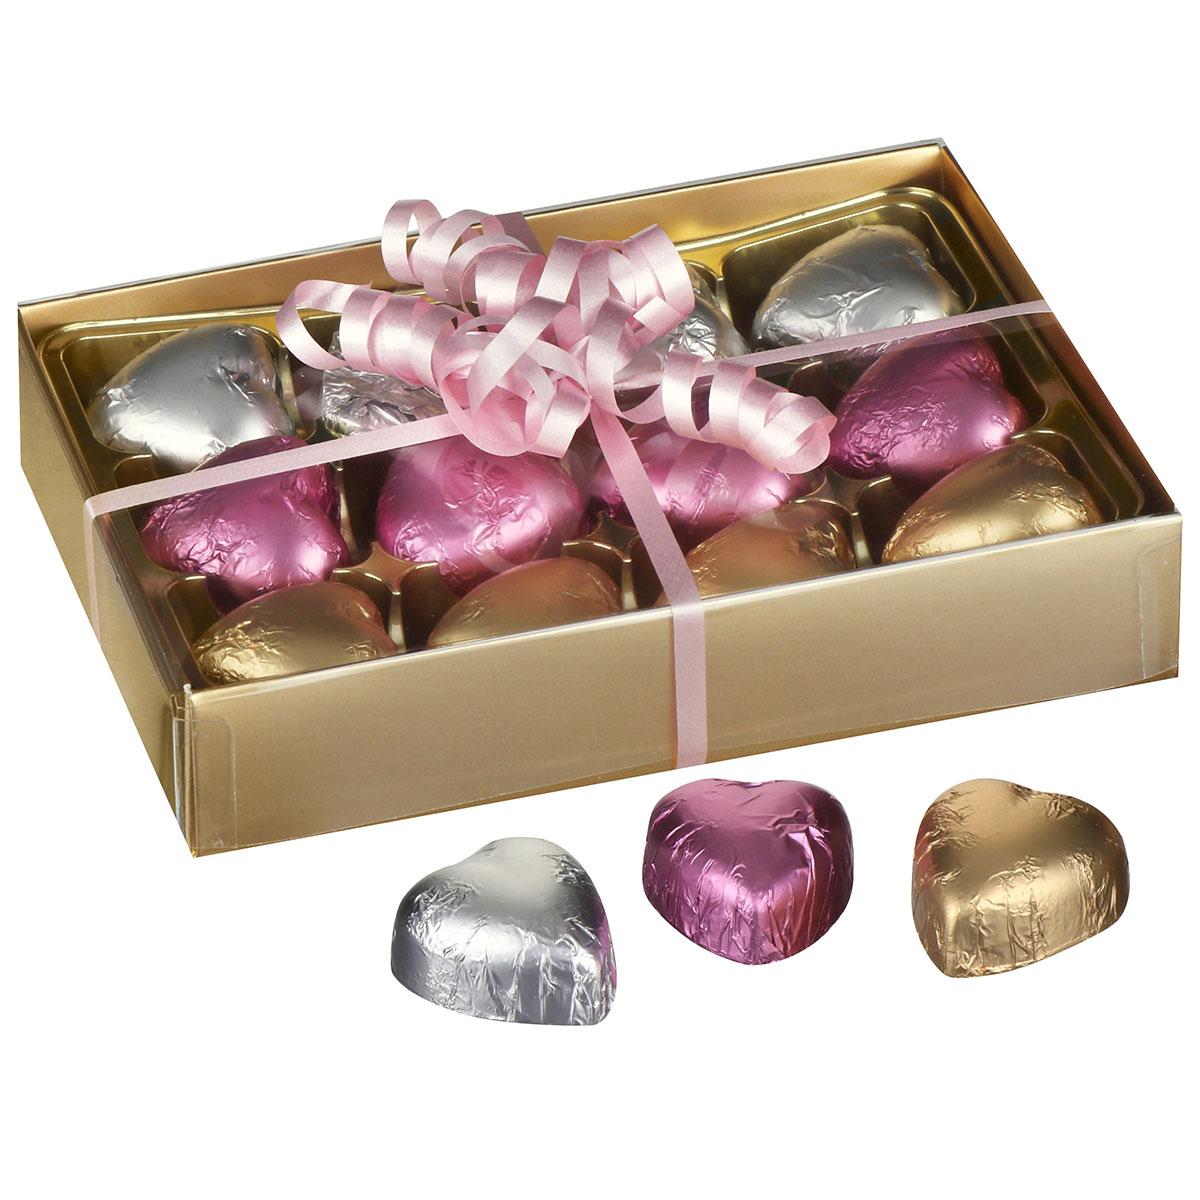 12 Hearts Belgian Chocolates in Gold Presentation Box